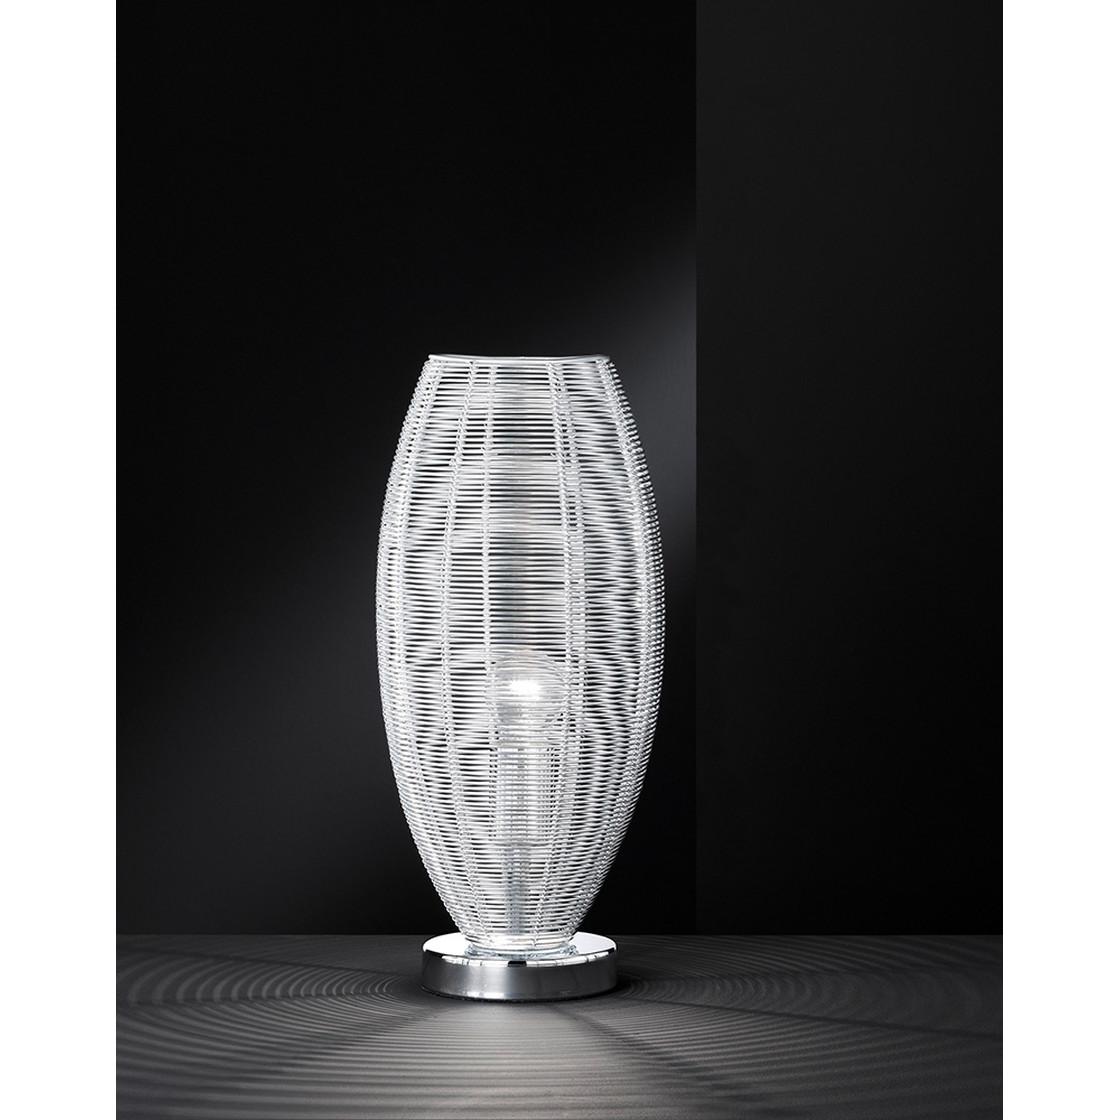 wofi modena tischleuchte silber oval lampen rampe d 39 99. Black Bedroom Furniture Sets. Home Design Ideas